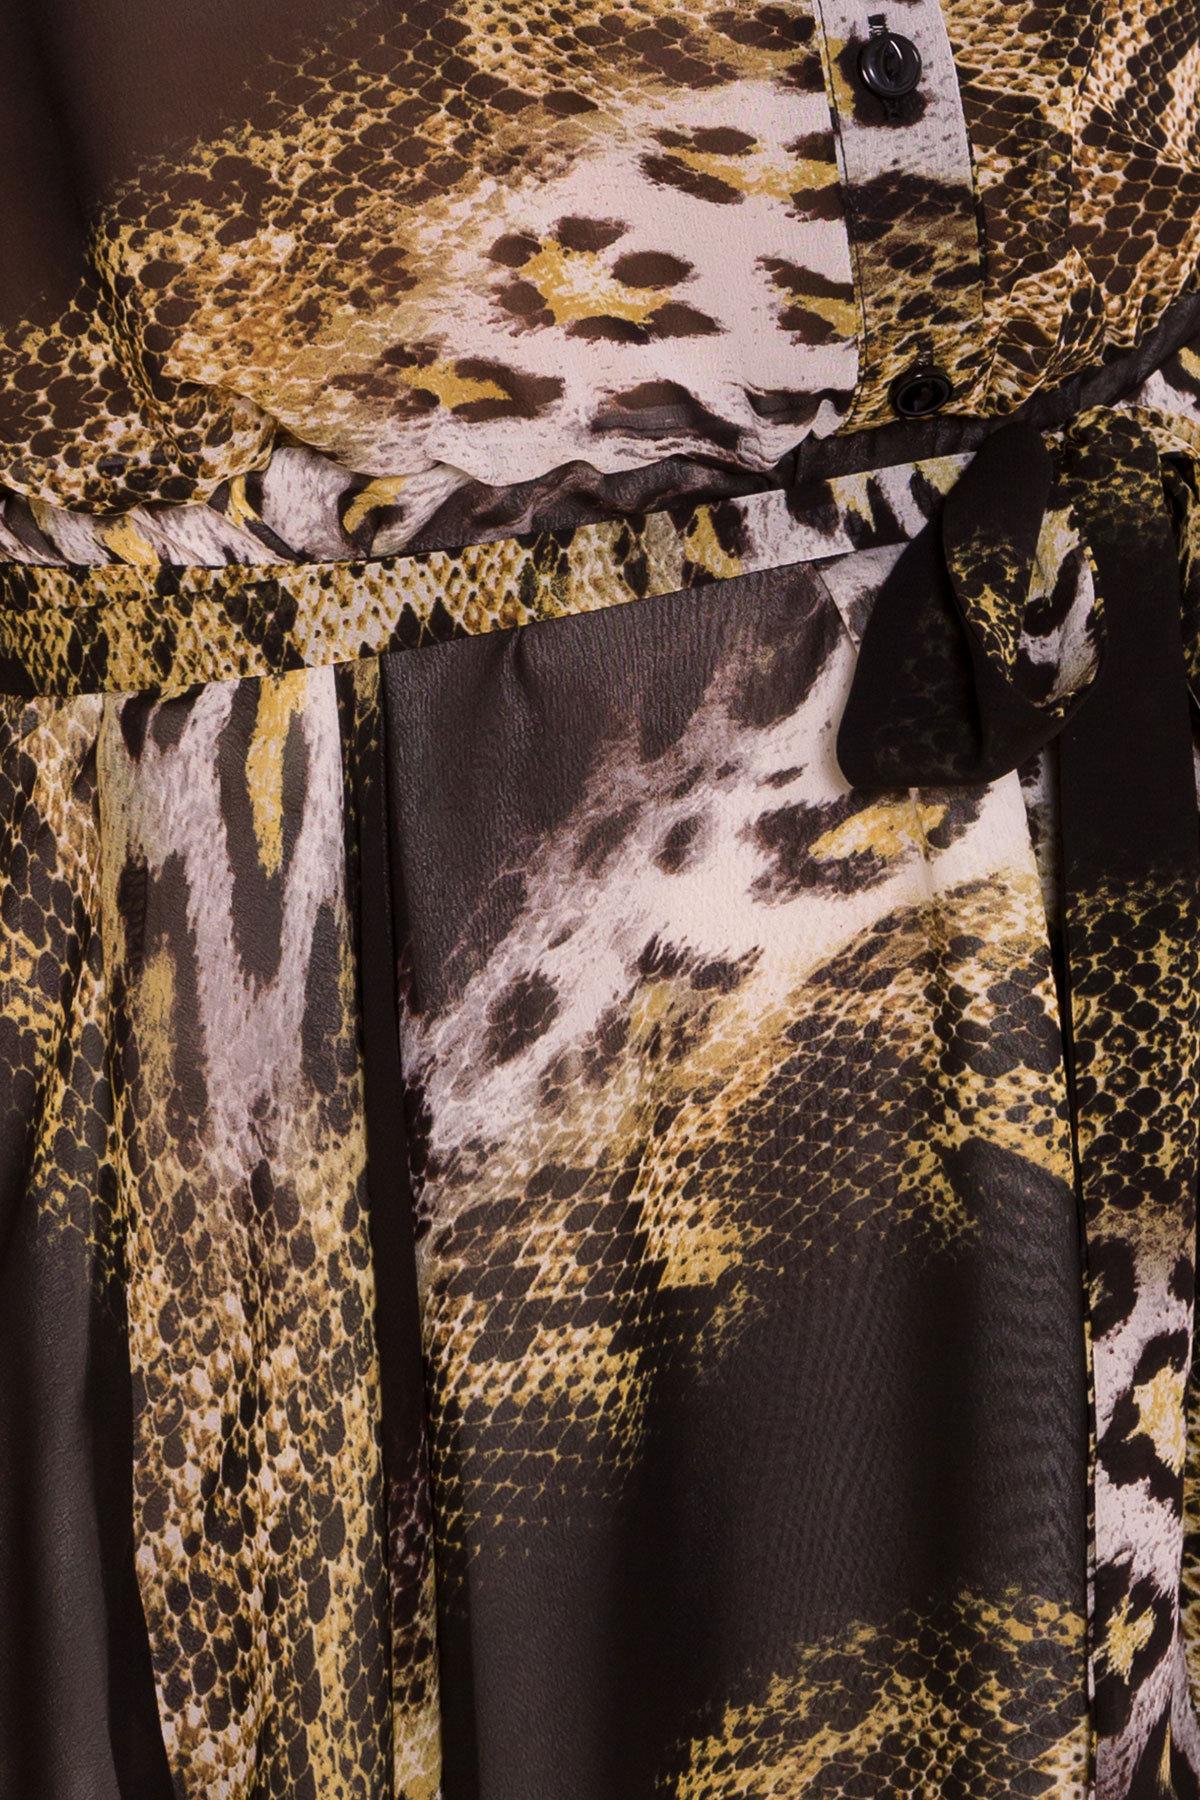 Платье Санжар 6935 АРТ. 42078 Цвет: Леоп абстр беж/чер - фото 4, интернет магазин tm-modus.ru